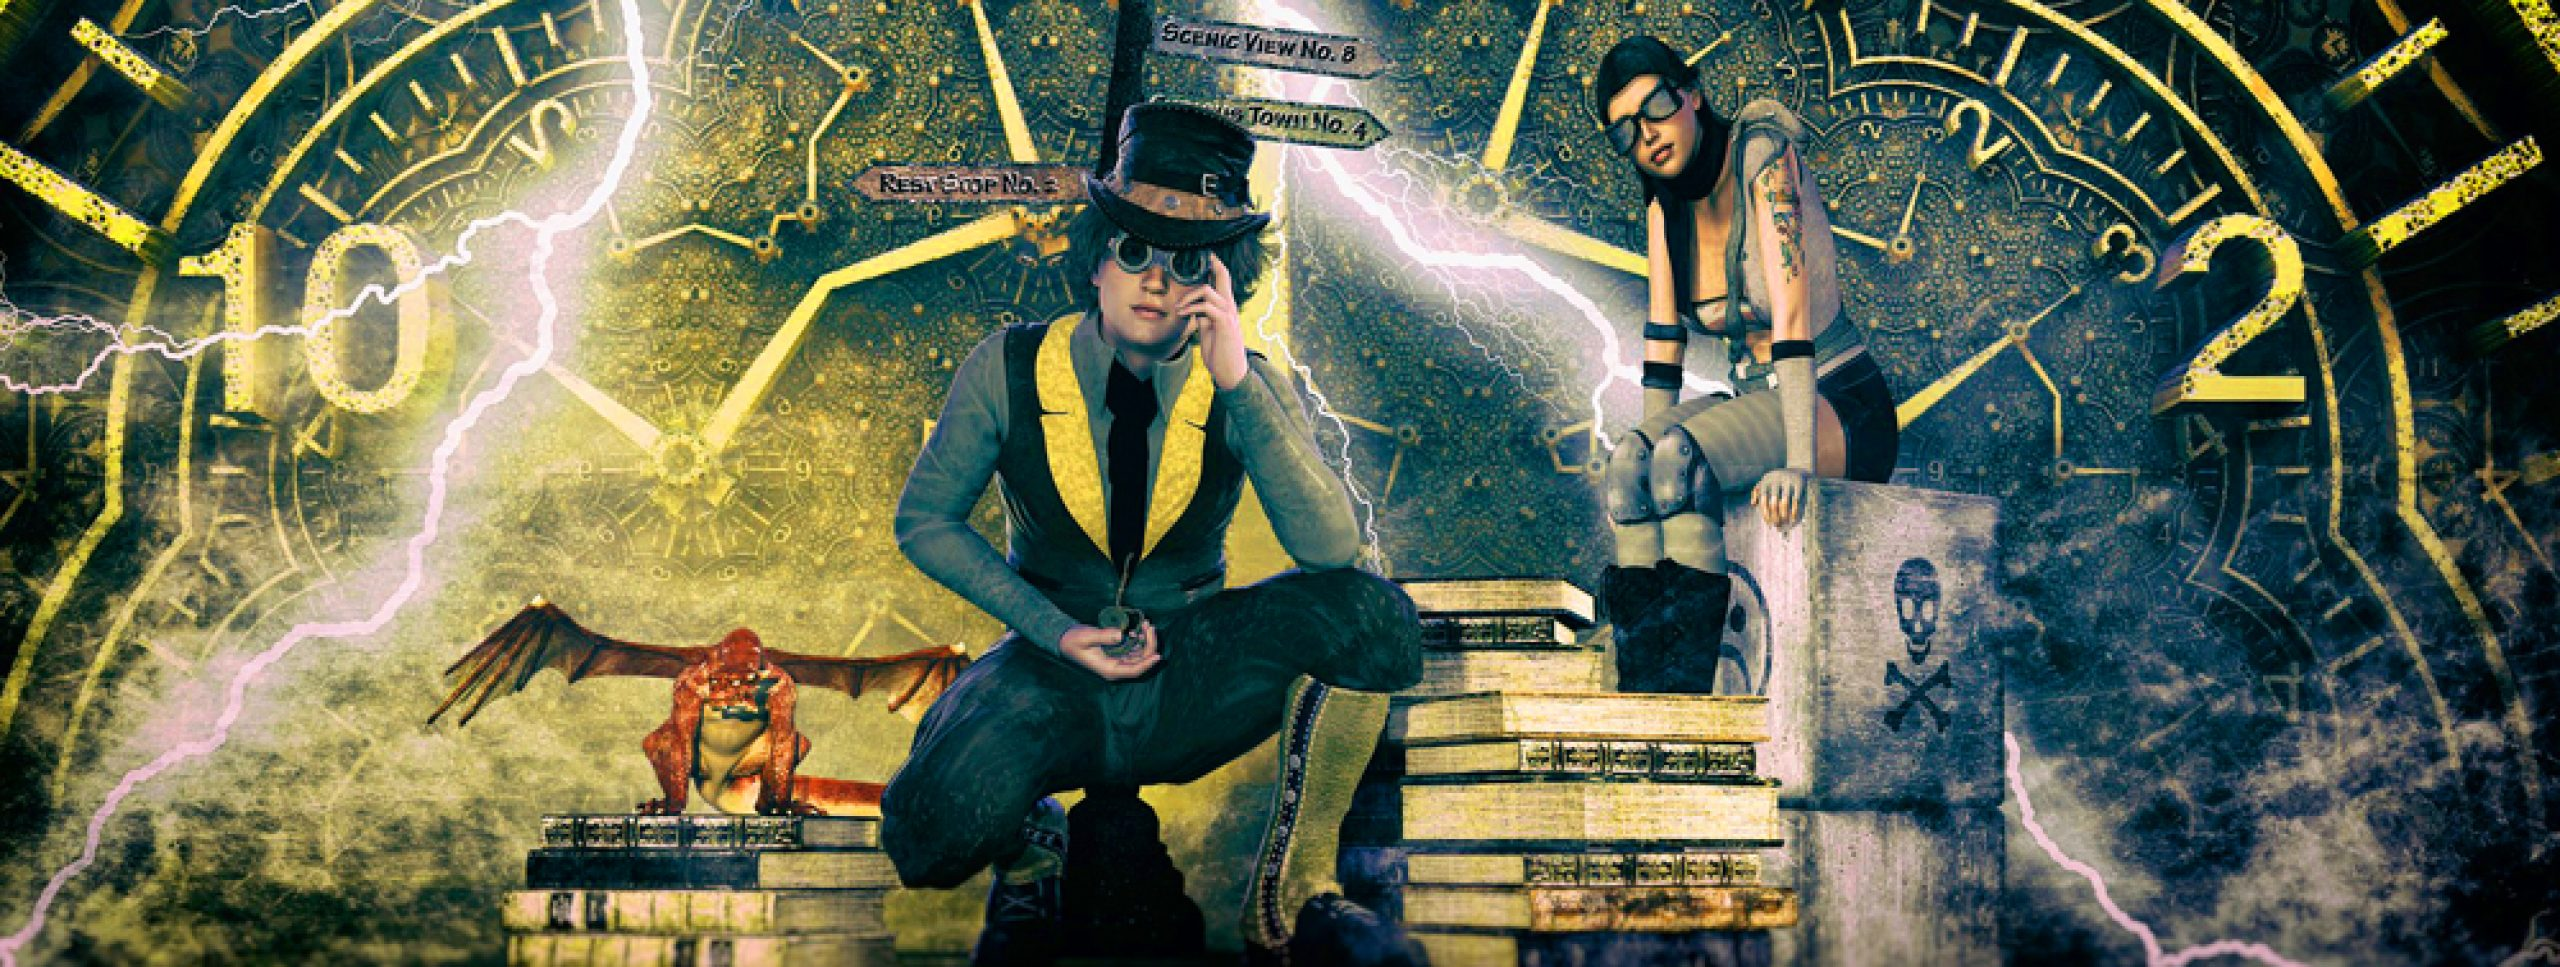 cropped-2019-blog-header-yellow-steampunk-people-clock-books-2819946_1920-2.jpg